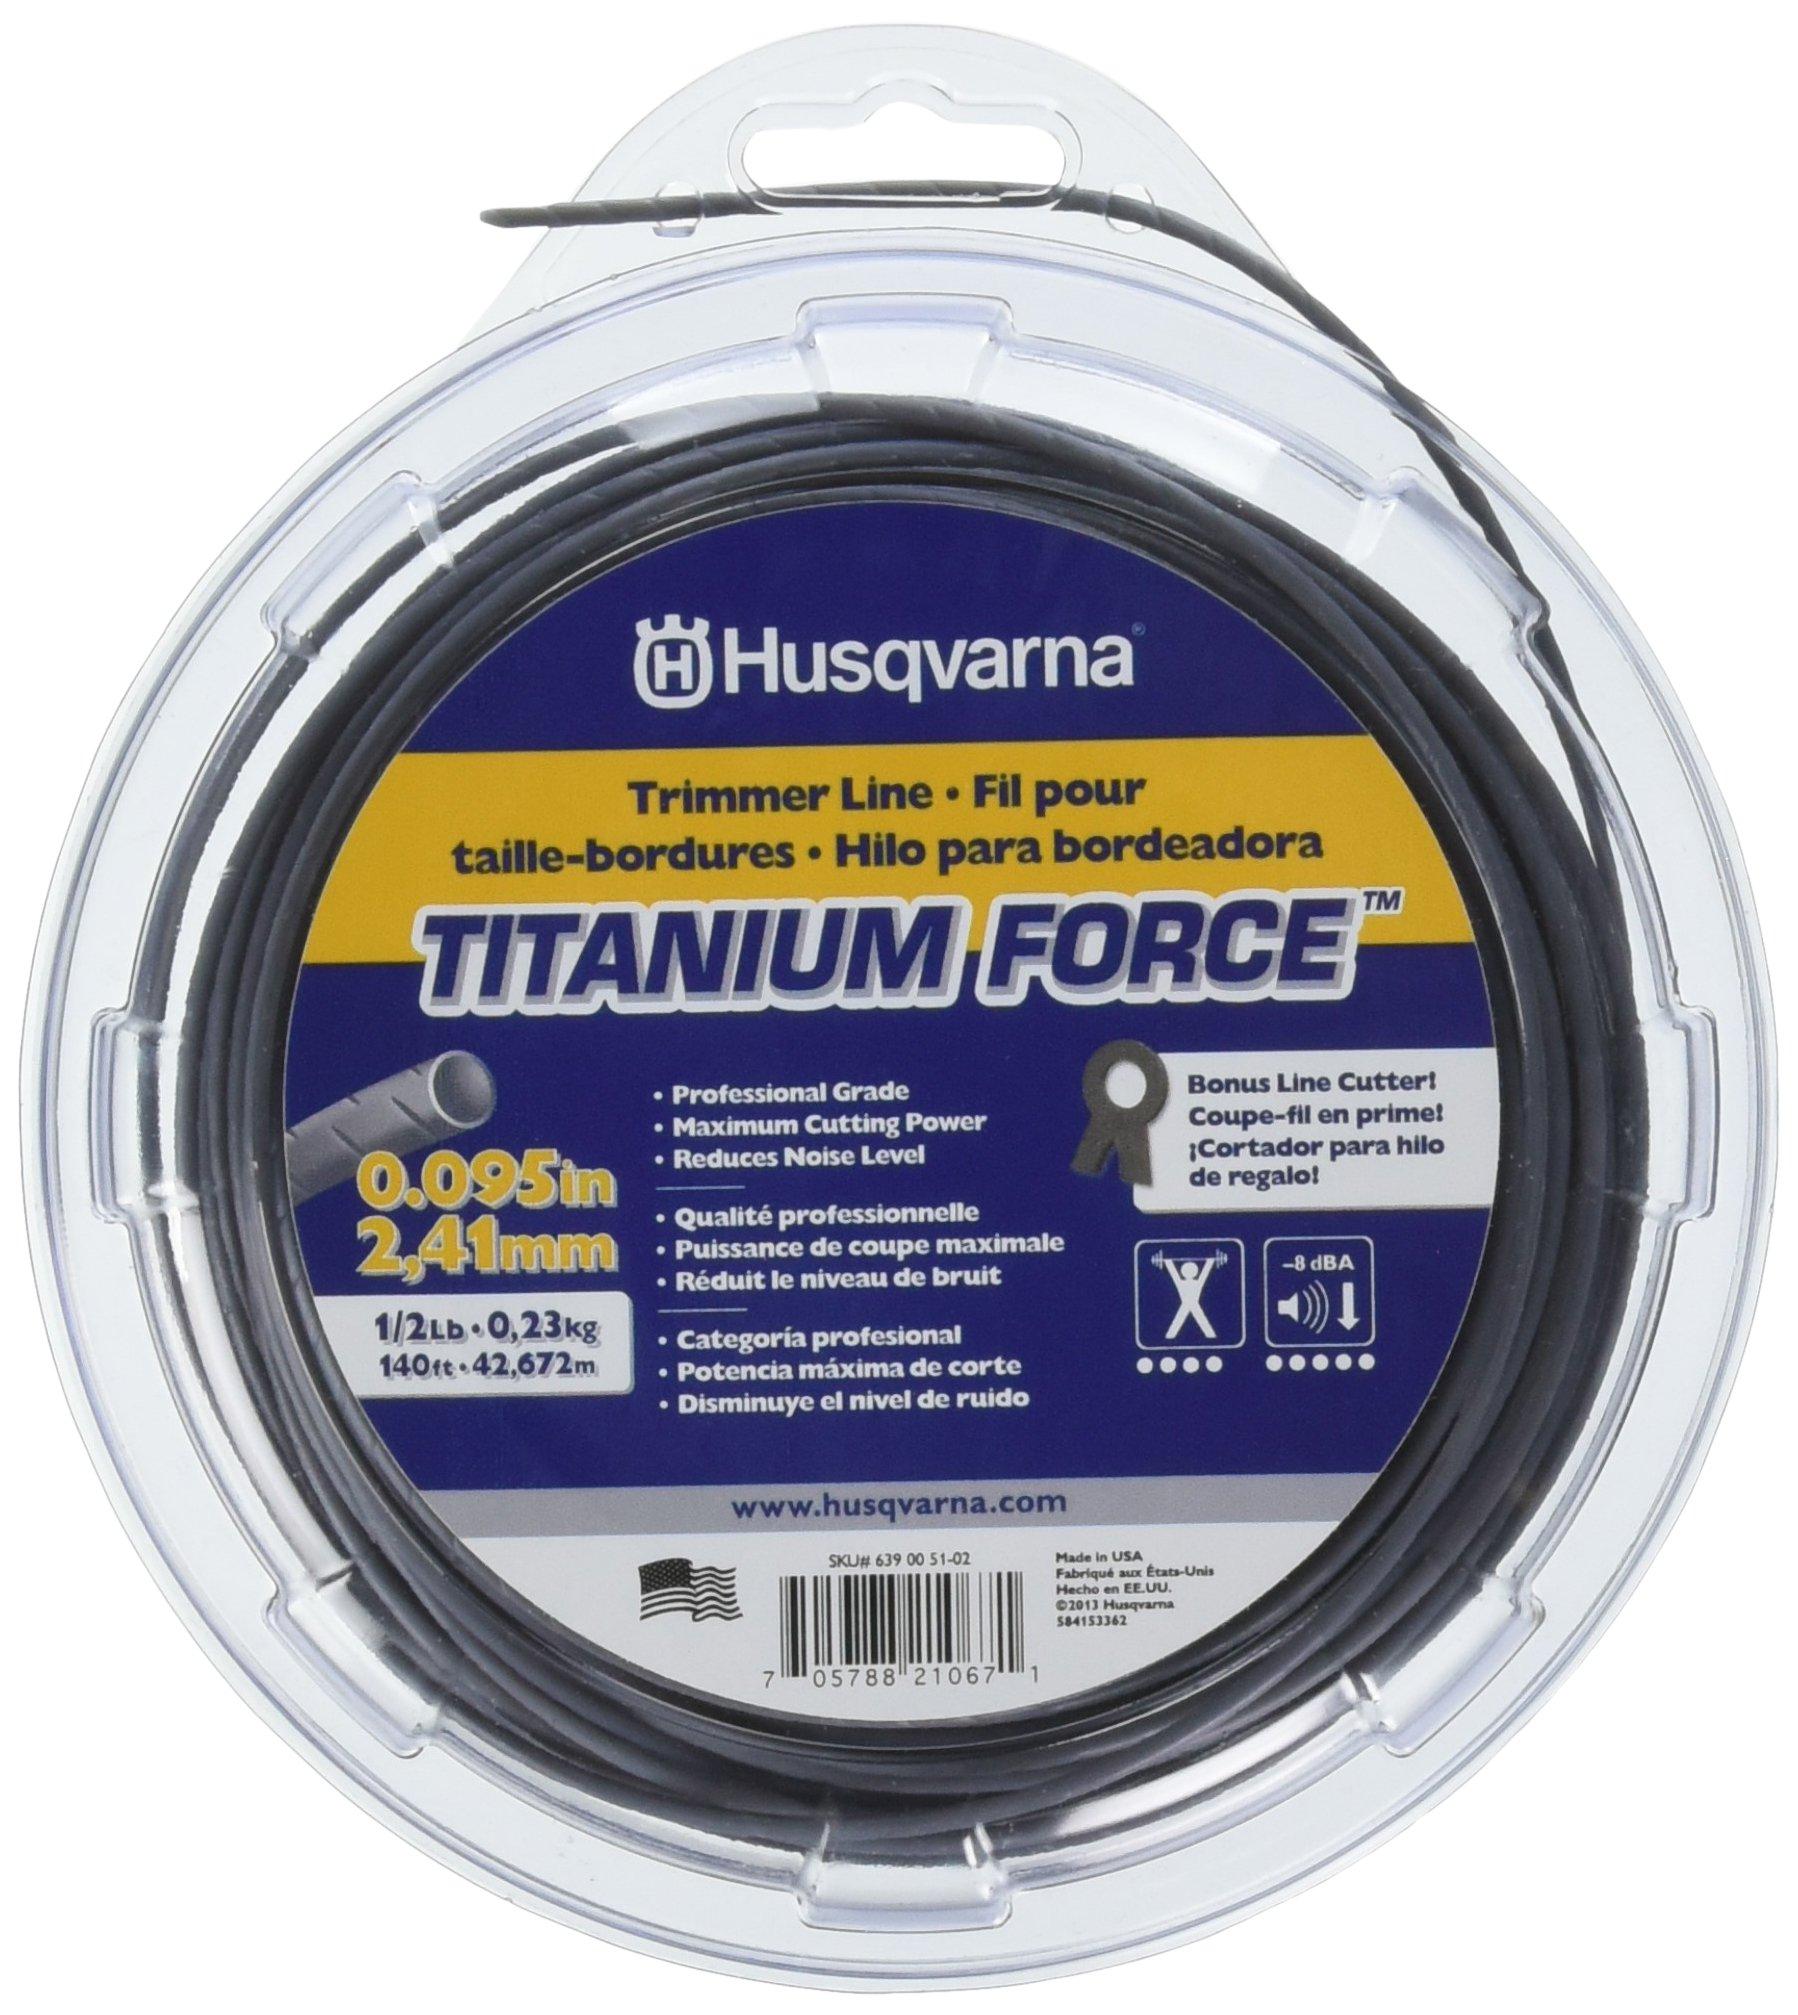 Husqvarna 639005102 Titanium Force String Trimmer Line .095-Inch by 1/2-Pound Donut